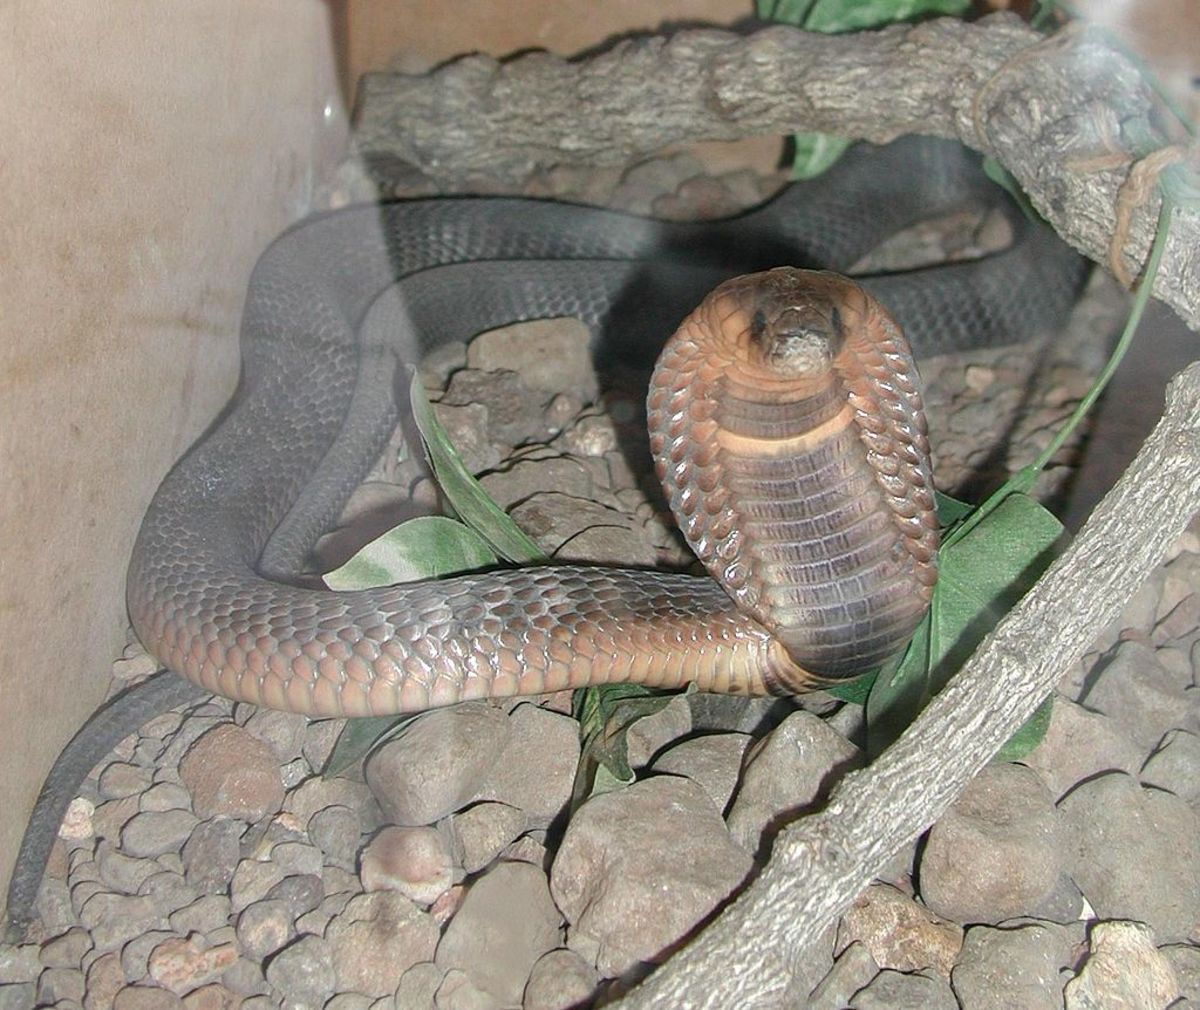 An Egyptian cobra bred in captivity